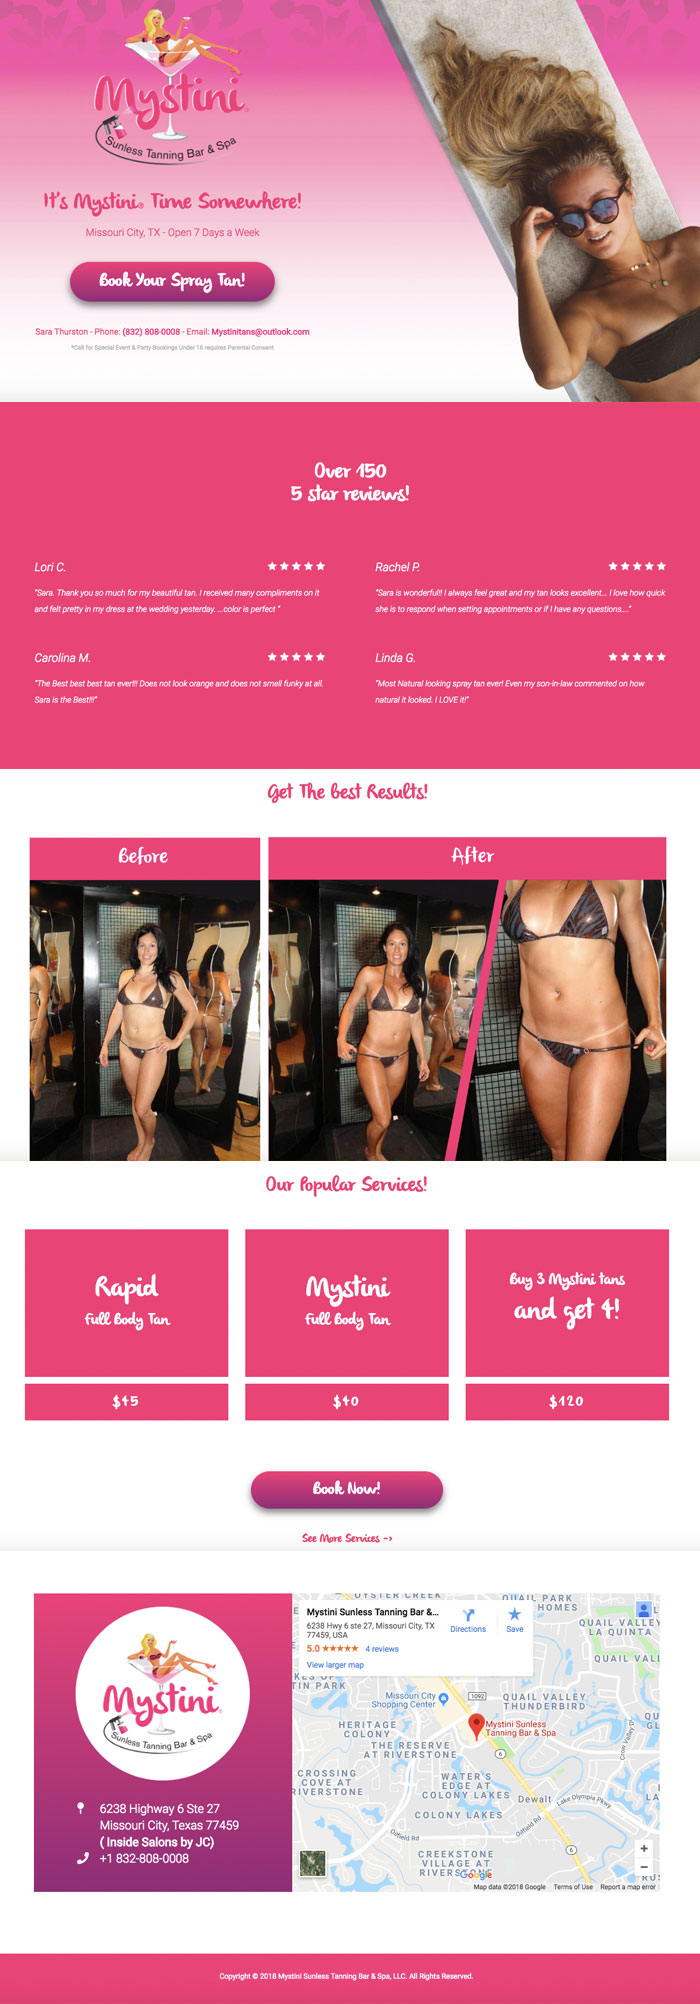 salon-landing-page-example.jpg